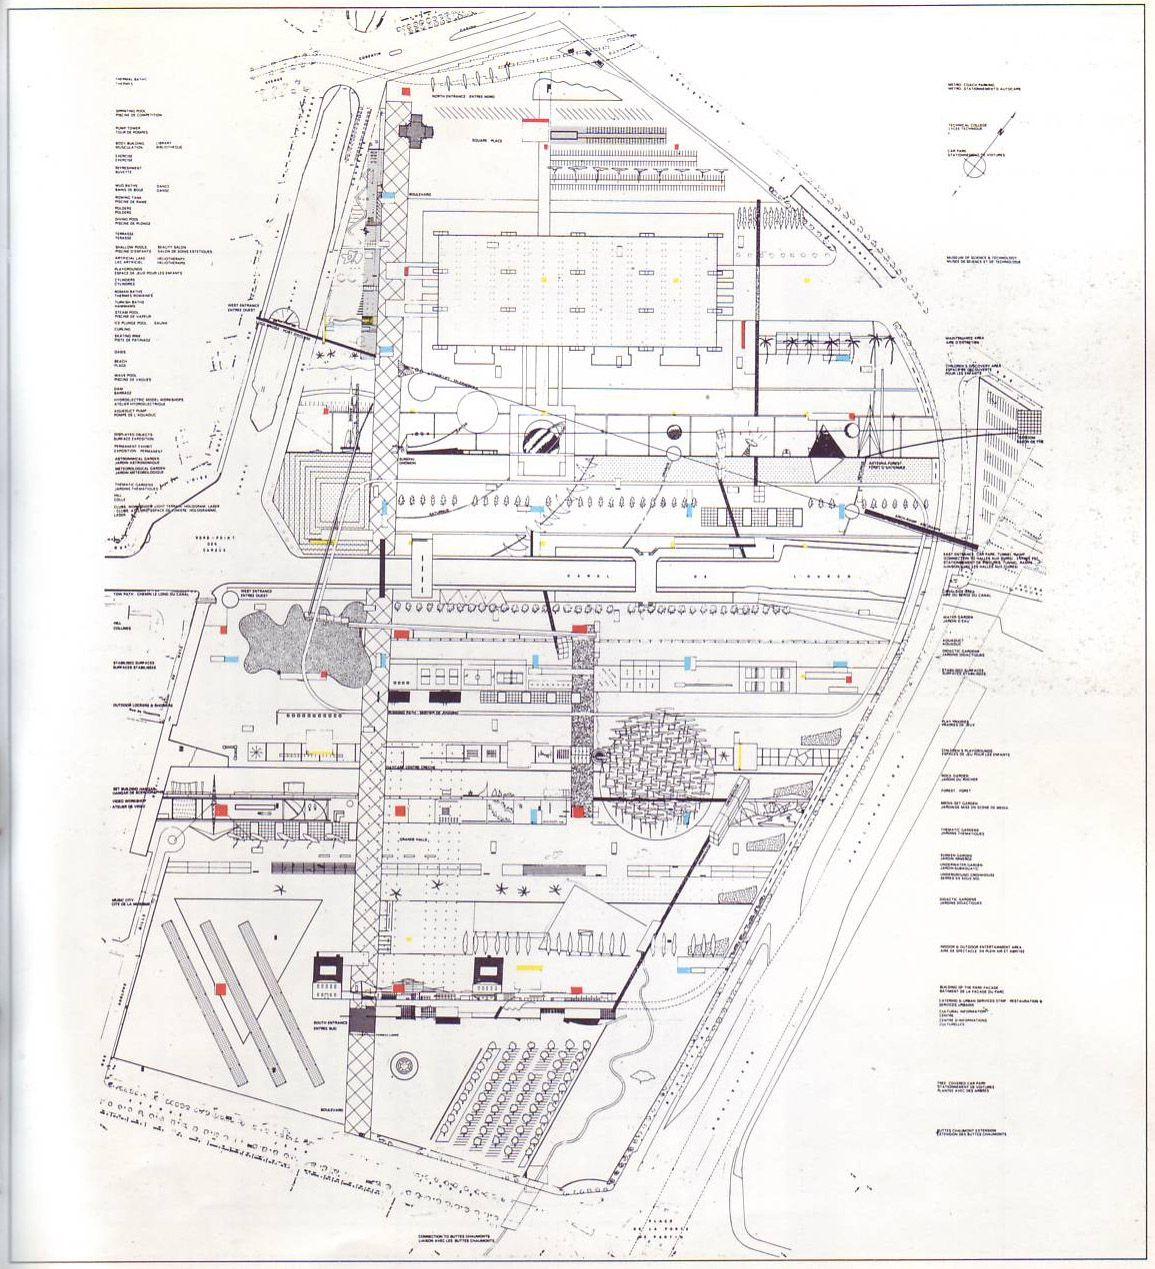 oma parc de la villette diagram brake light wiring toyota 4runner spaces pinterest urban